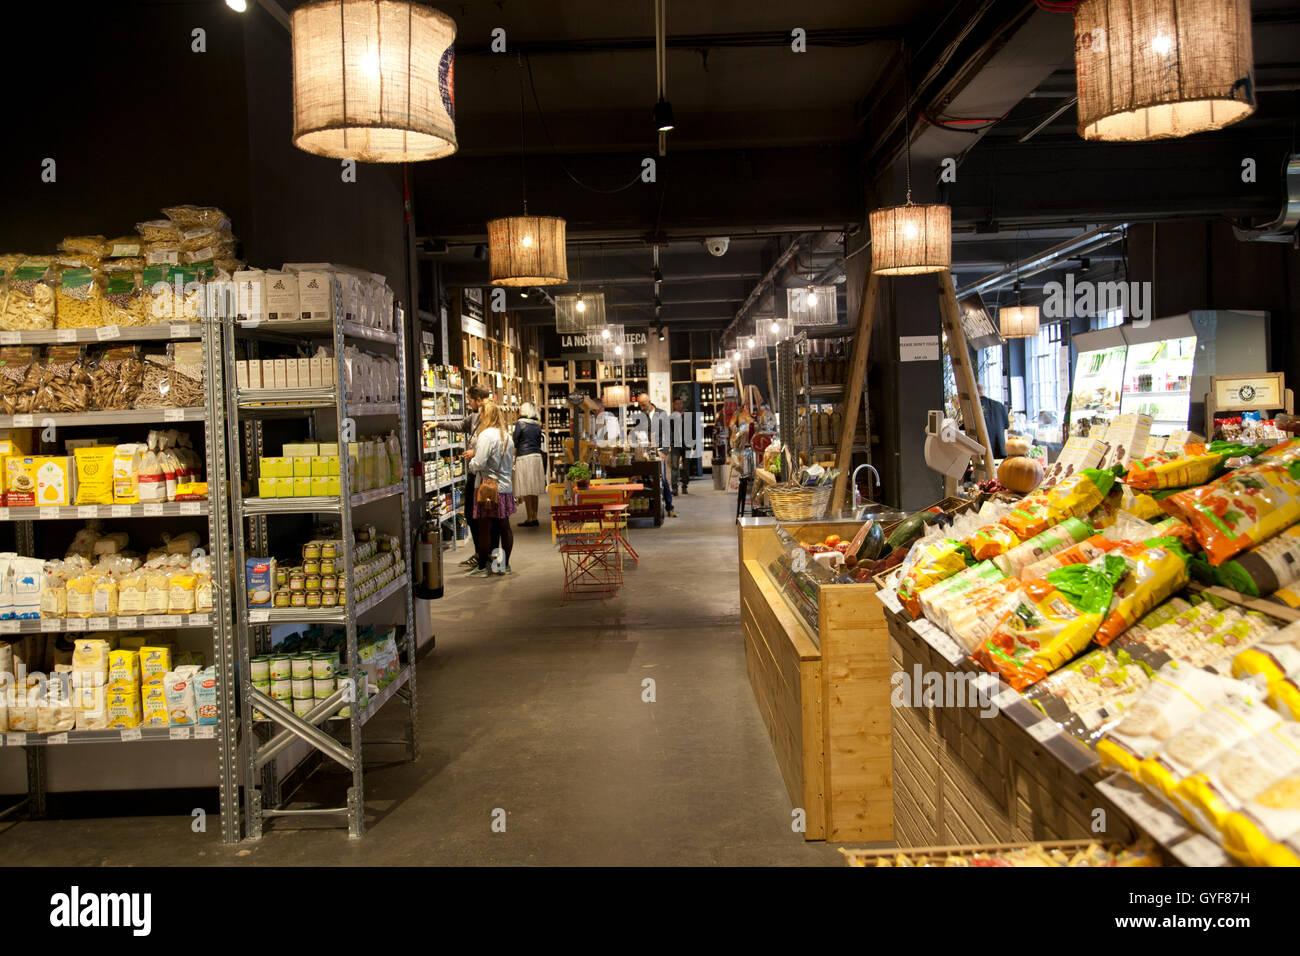 Mercato Metropolitano Italian Farmers Market Shop  on Newington Causeway in SE1 - London UK - Stock Image